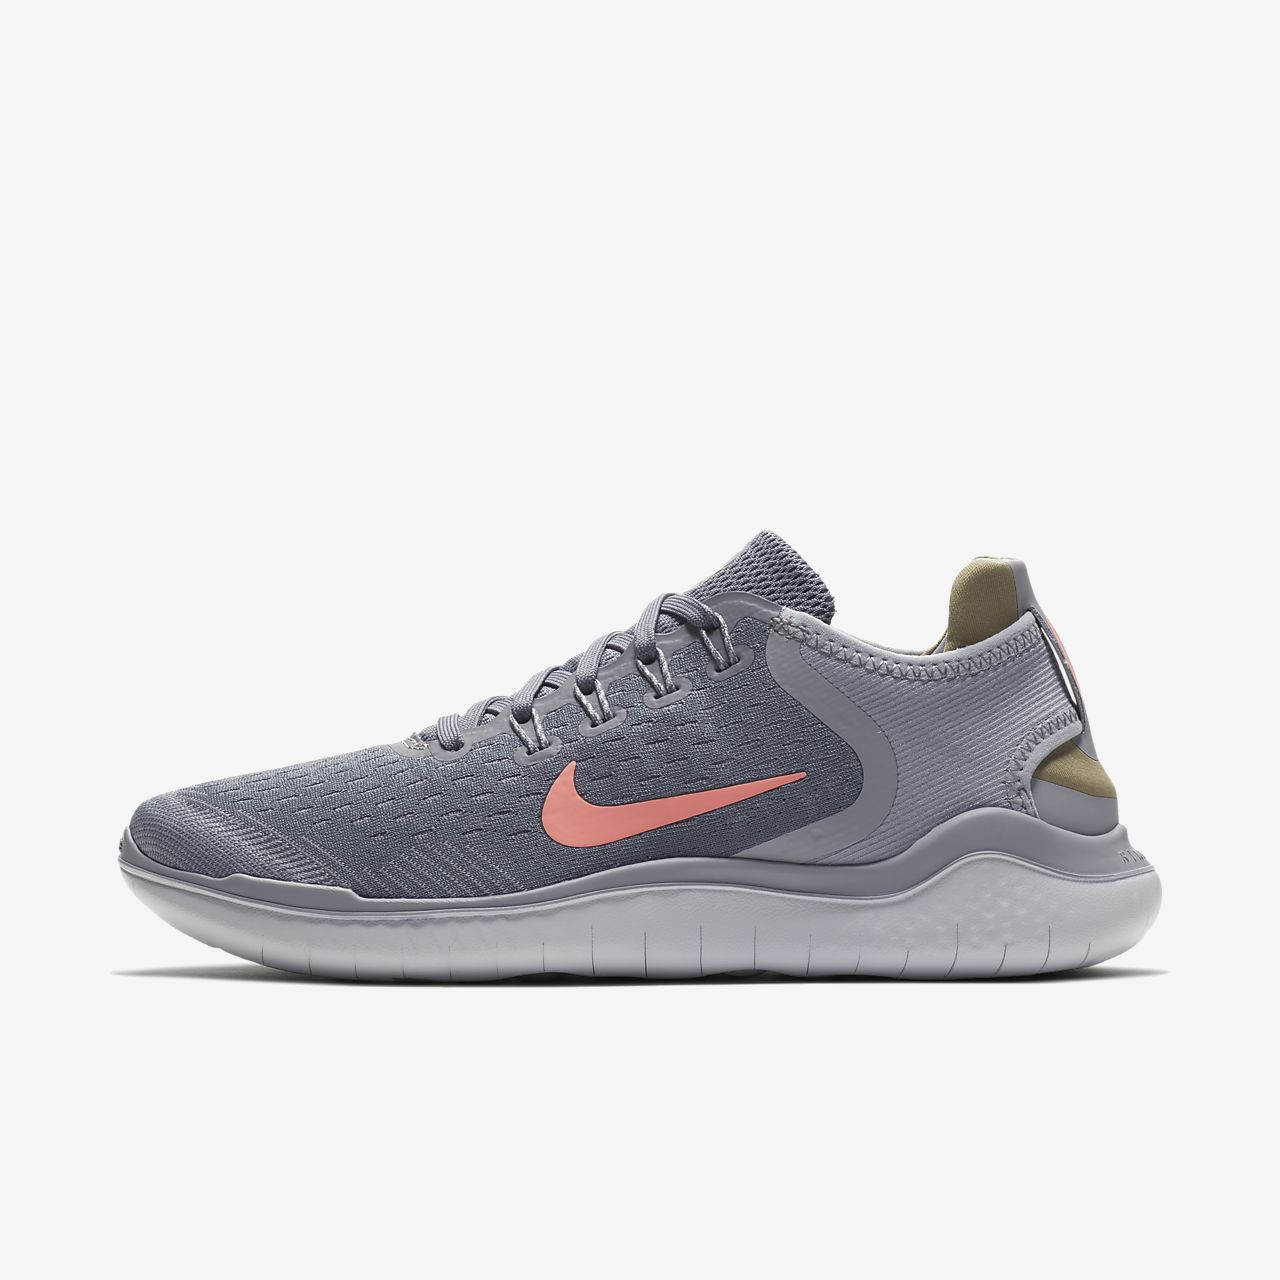 Women's Running Shoe. Nike Free RN 2018